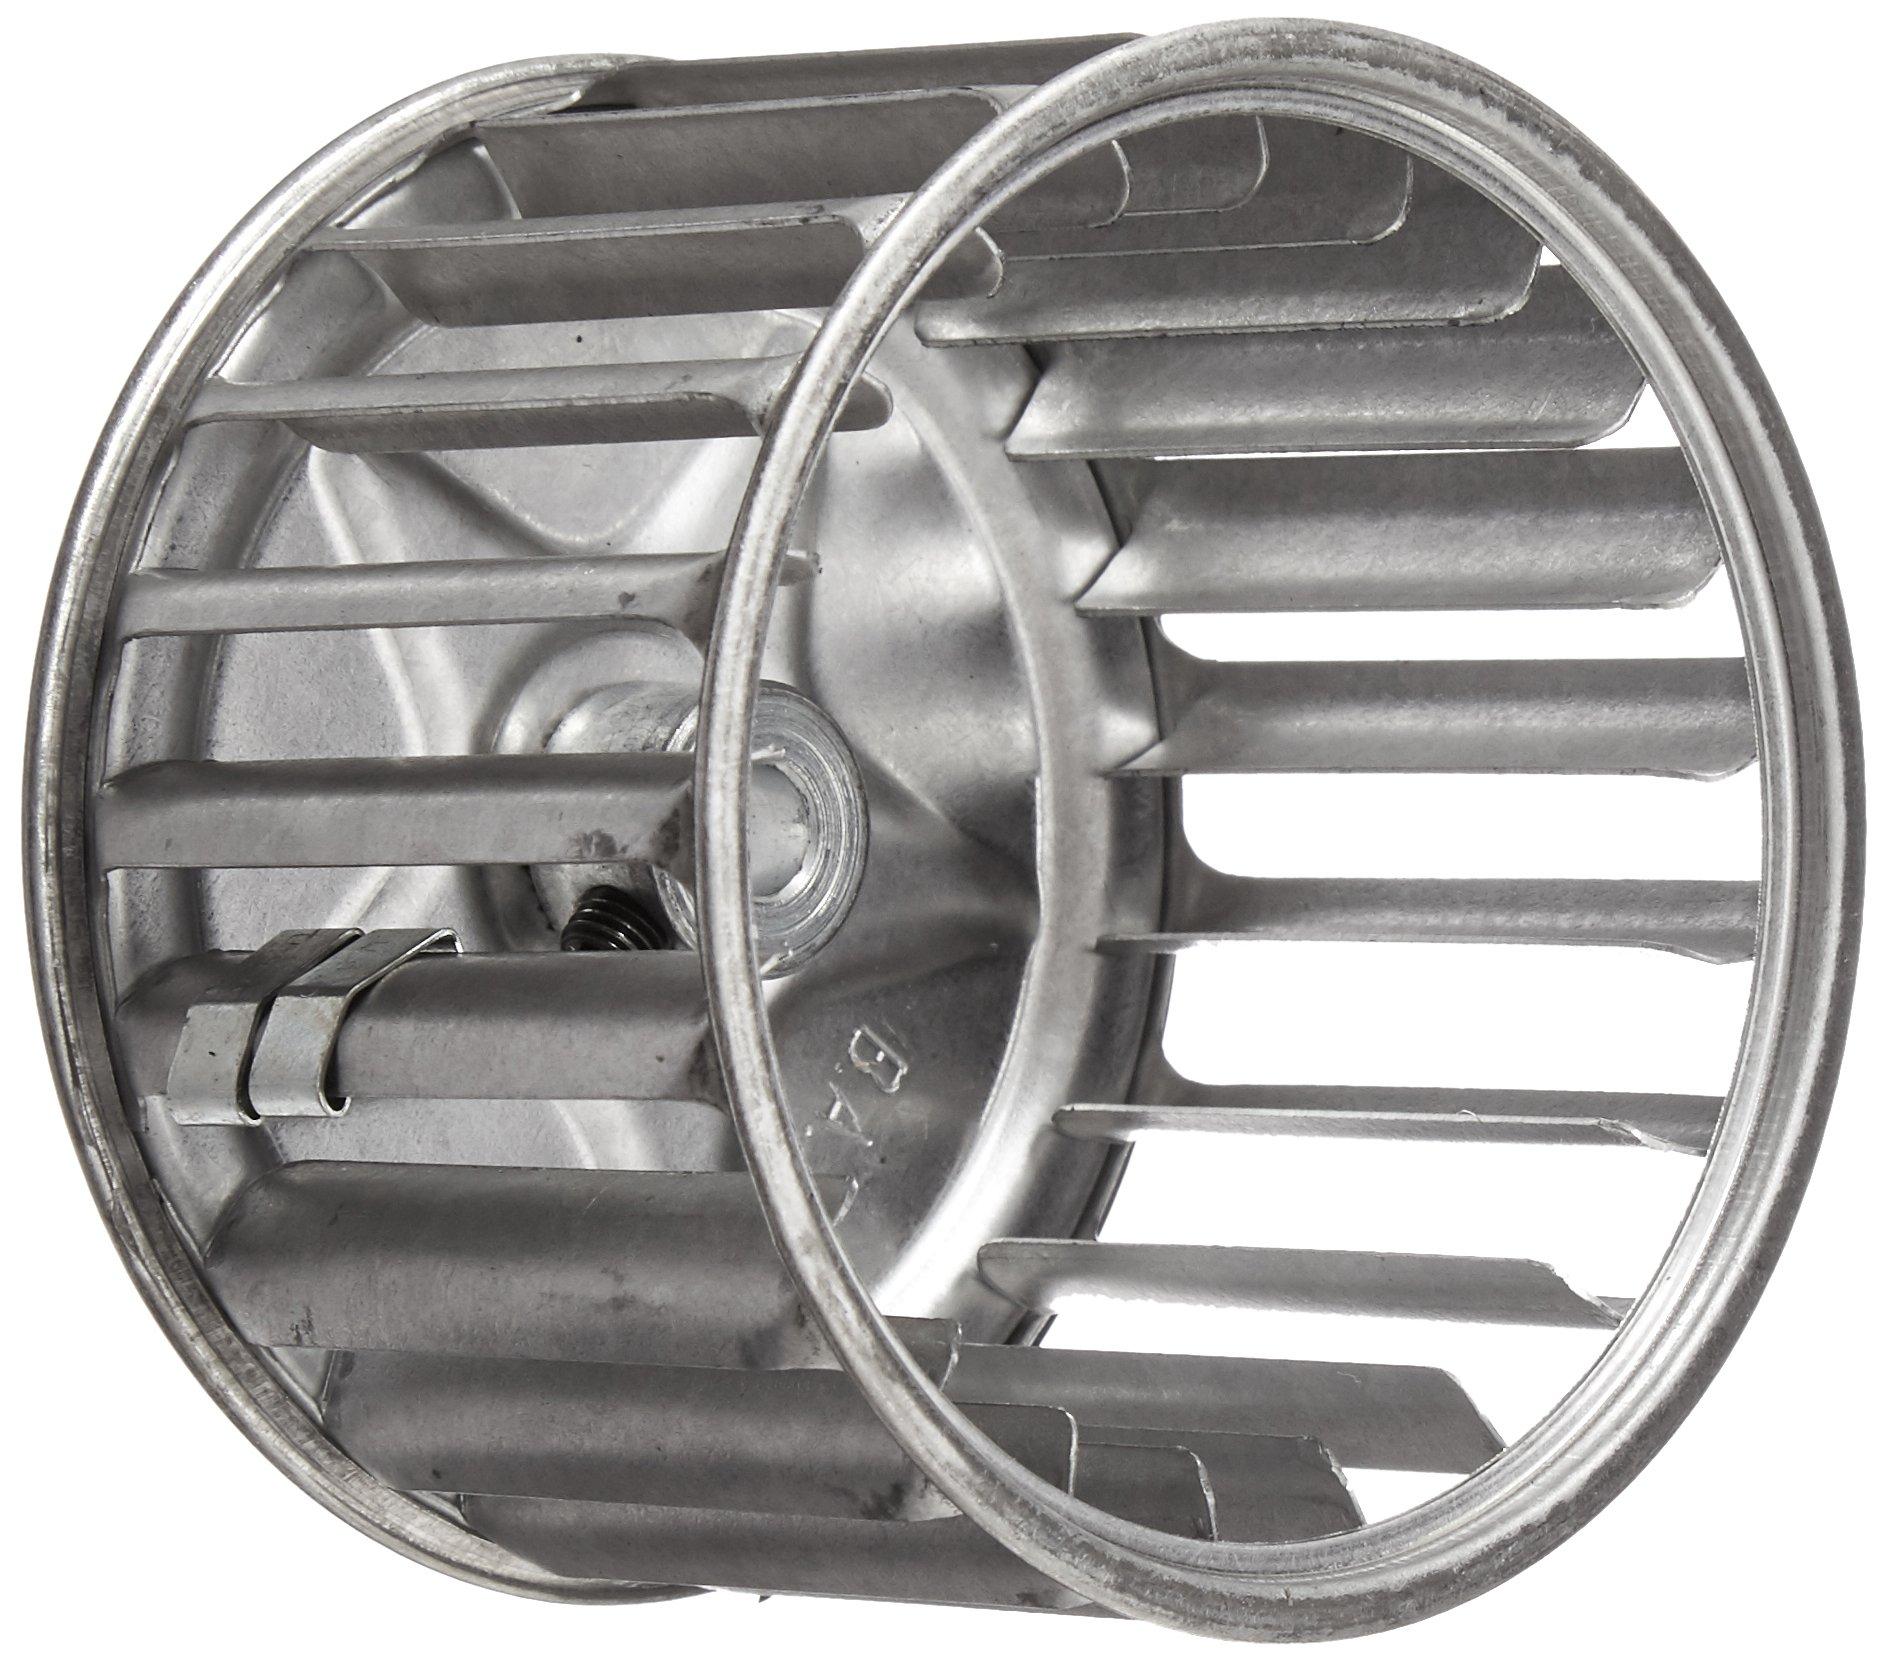 Tjernlund 950-1011 Impeller Wheel Kit for HS1, GPAK1 Sidewall Power Venters by Tjernlund